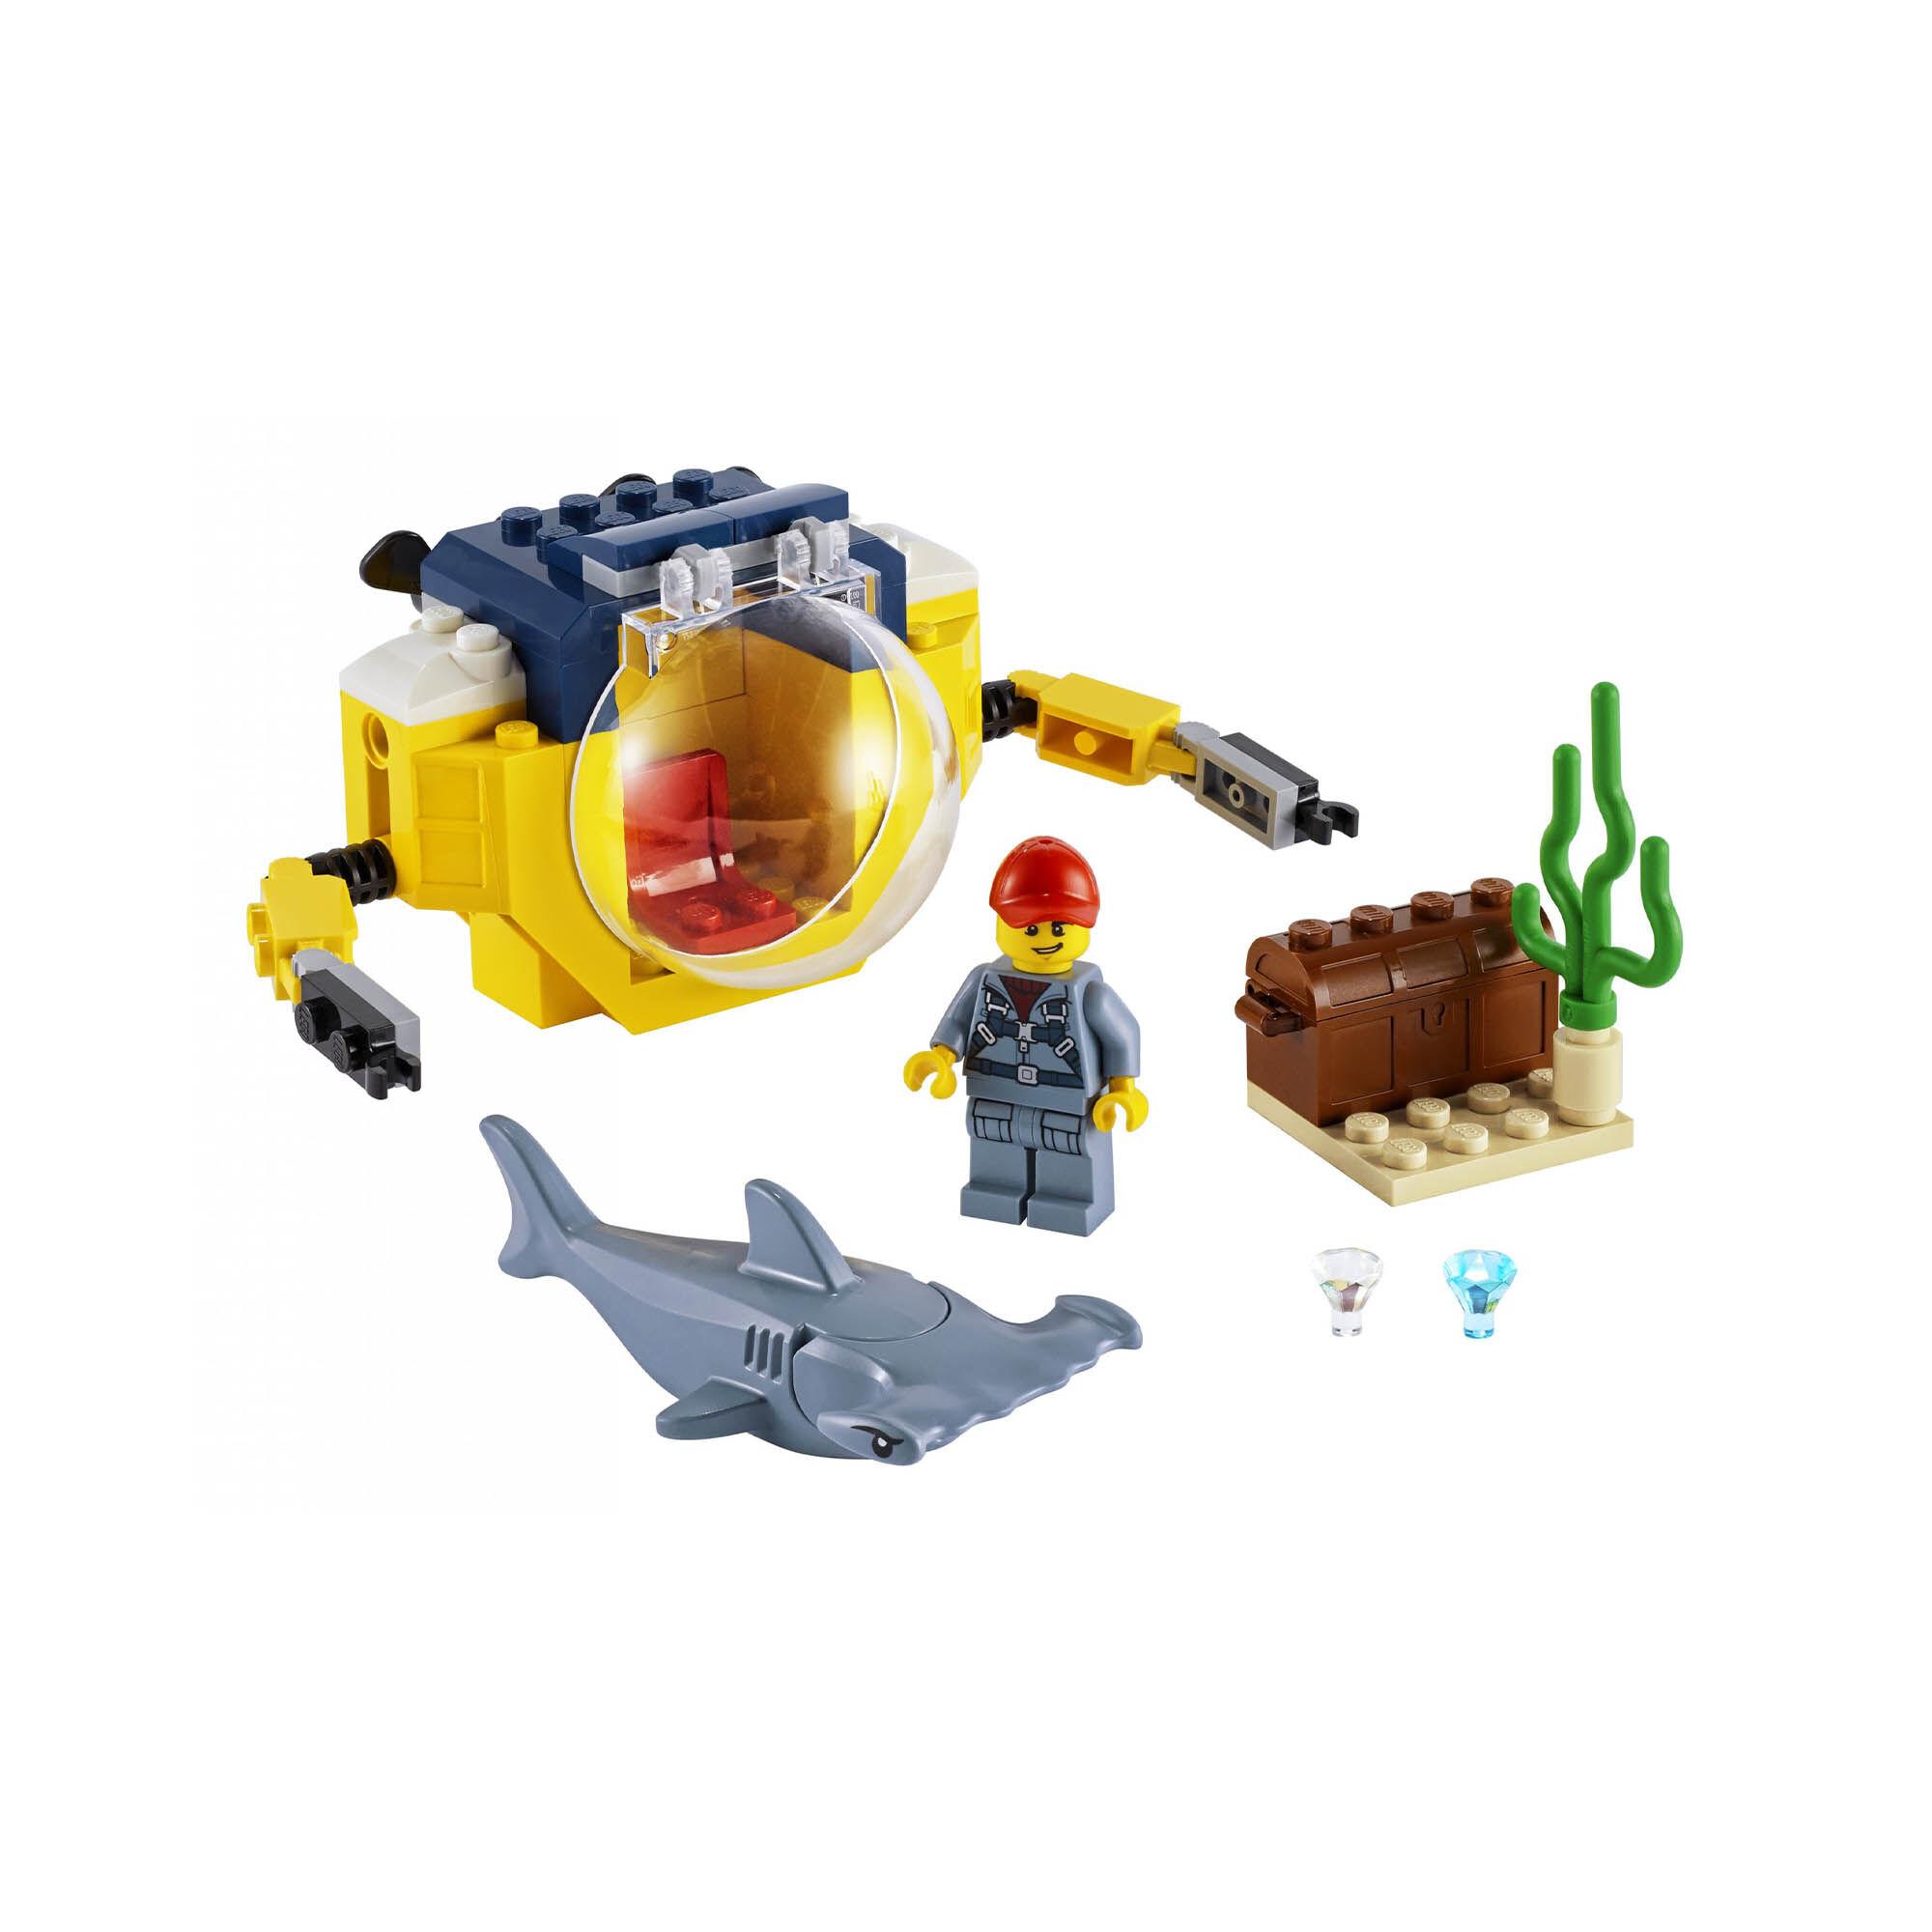 Le mini sous-marin 60263, , large